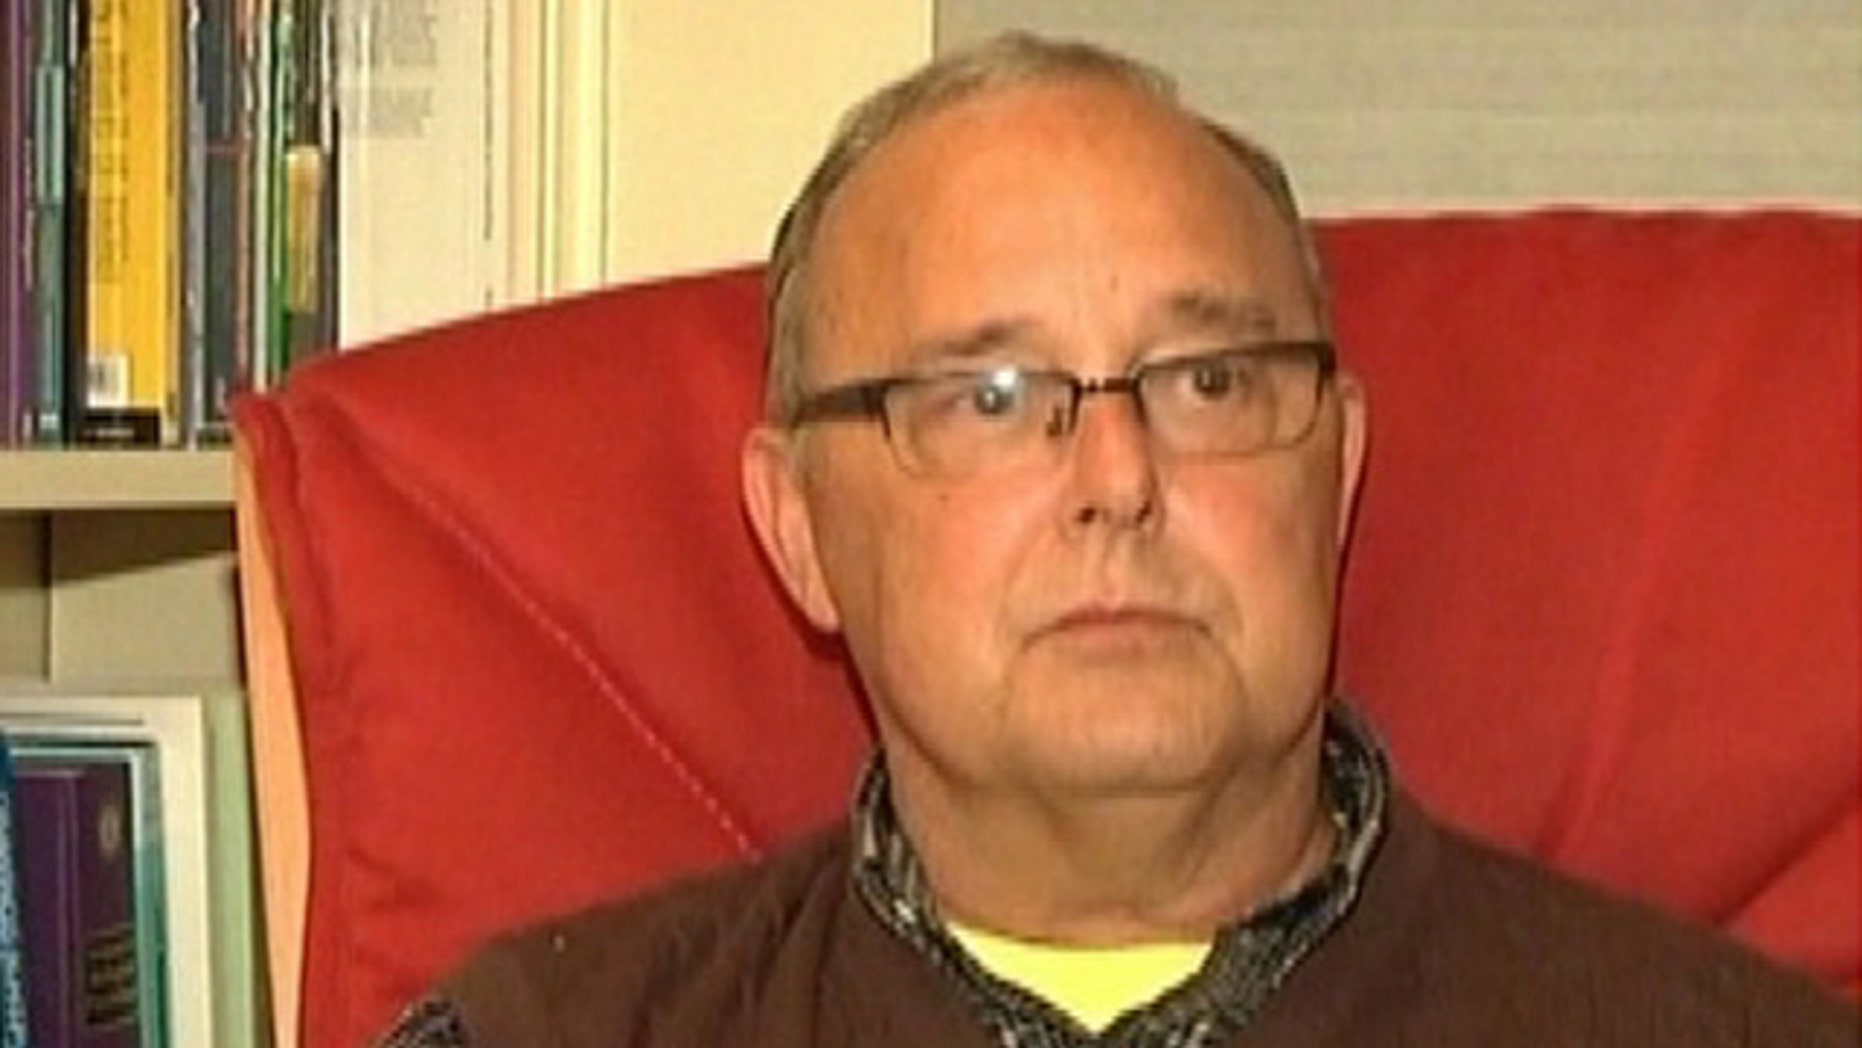 Thomas Sawyer, 61, says his urostomy bag was broken during a TSA pat-down at Detroit Metropolitan Airport earlier this month.